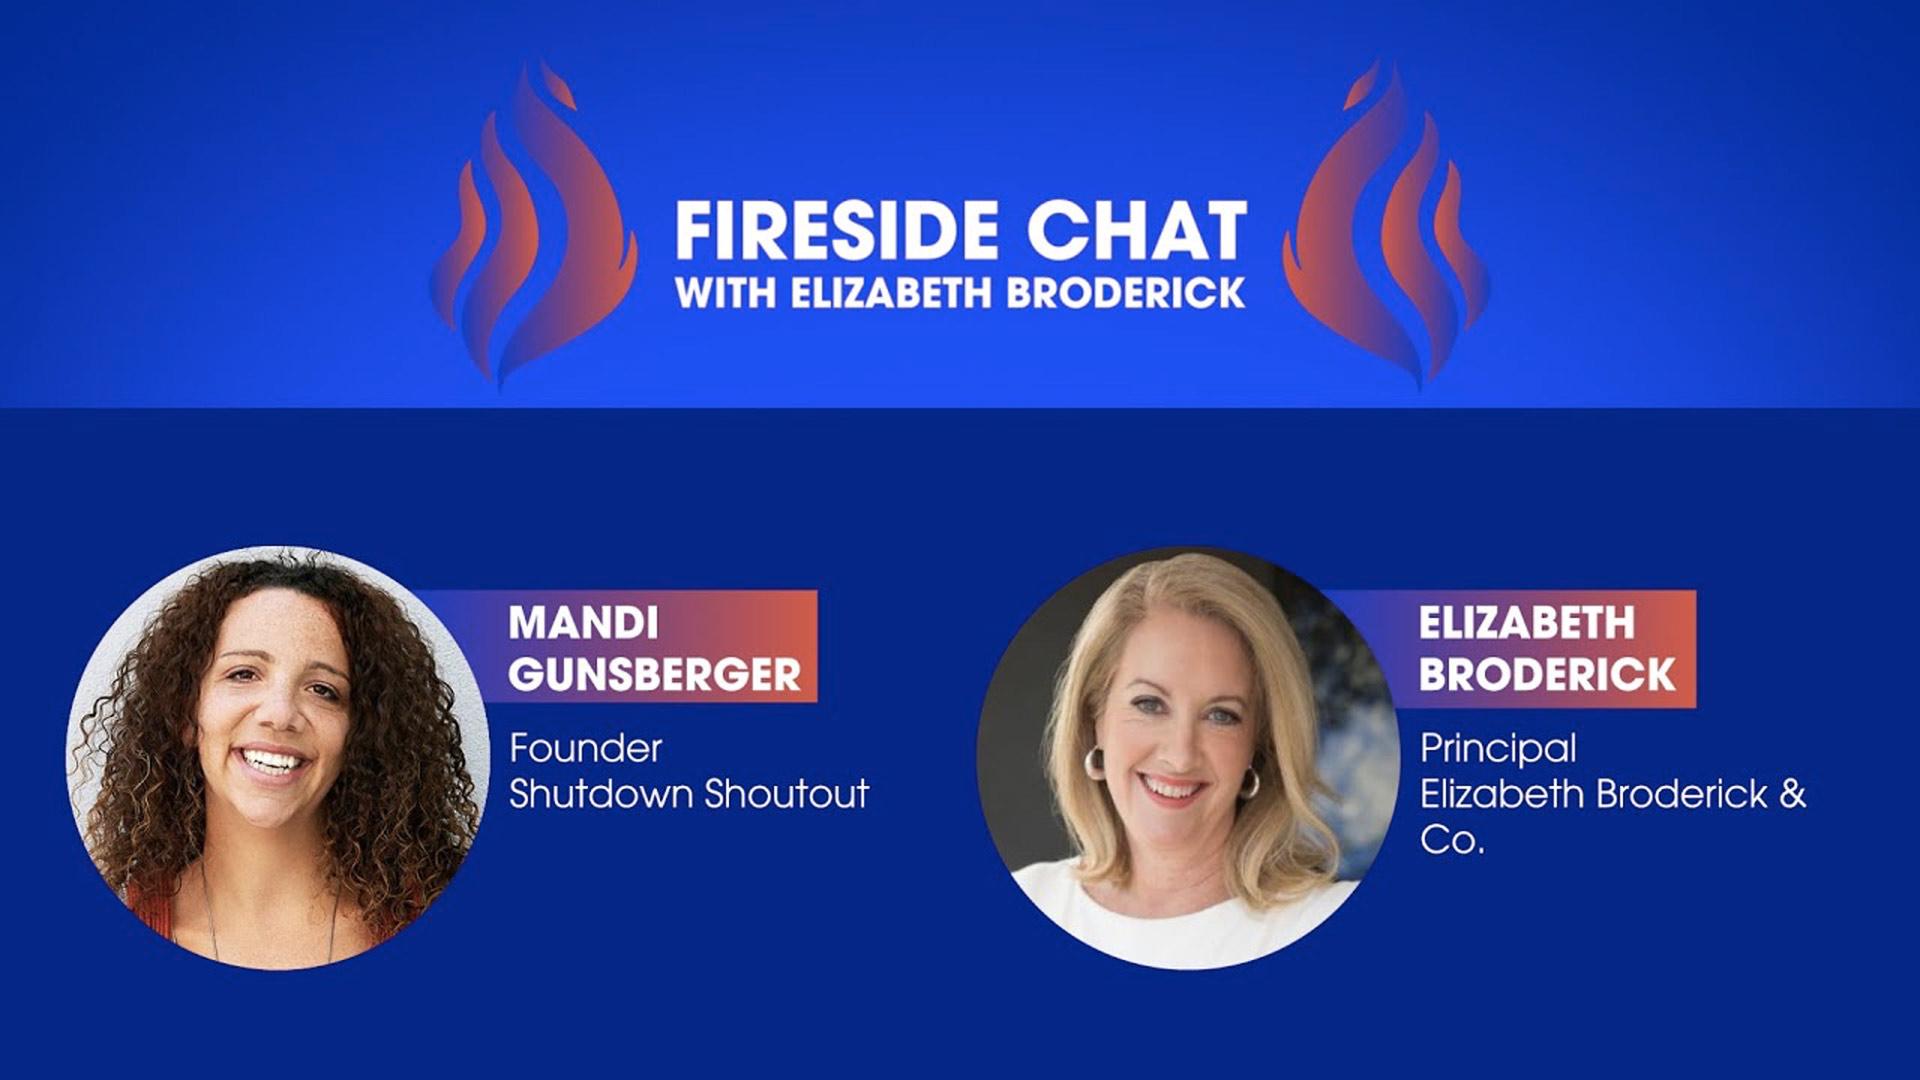 Fireside Chat with Elizabeth Broderick and Mandi Gunsberger